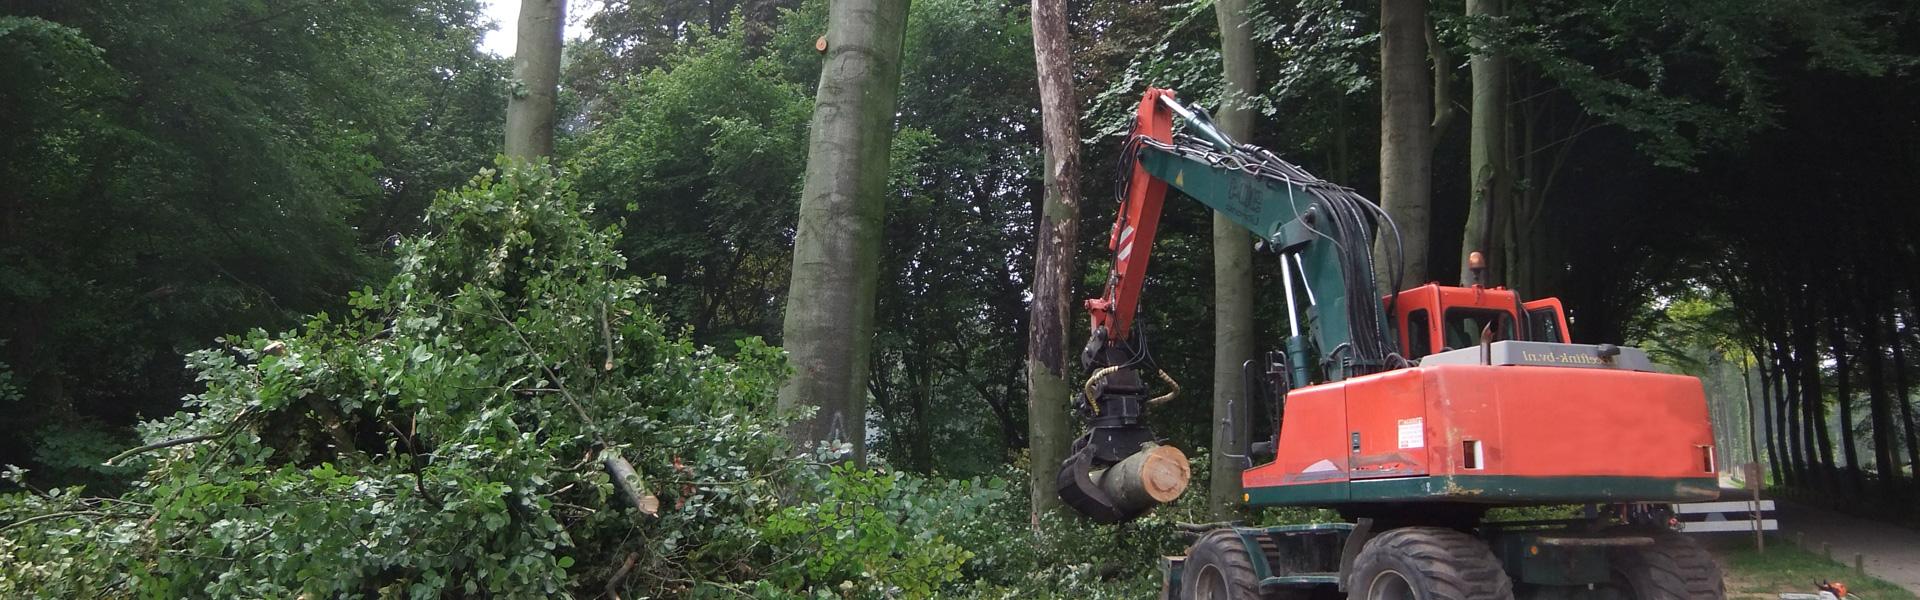 Overhangende takken snoeien - Groenbedrijf Limburg